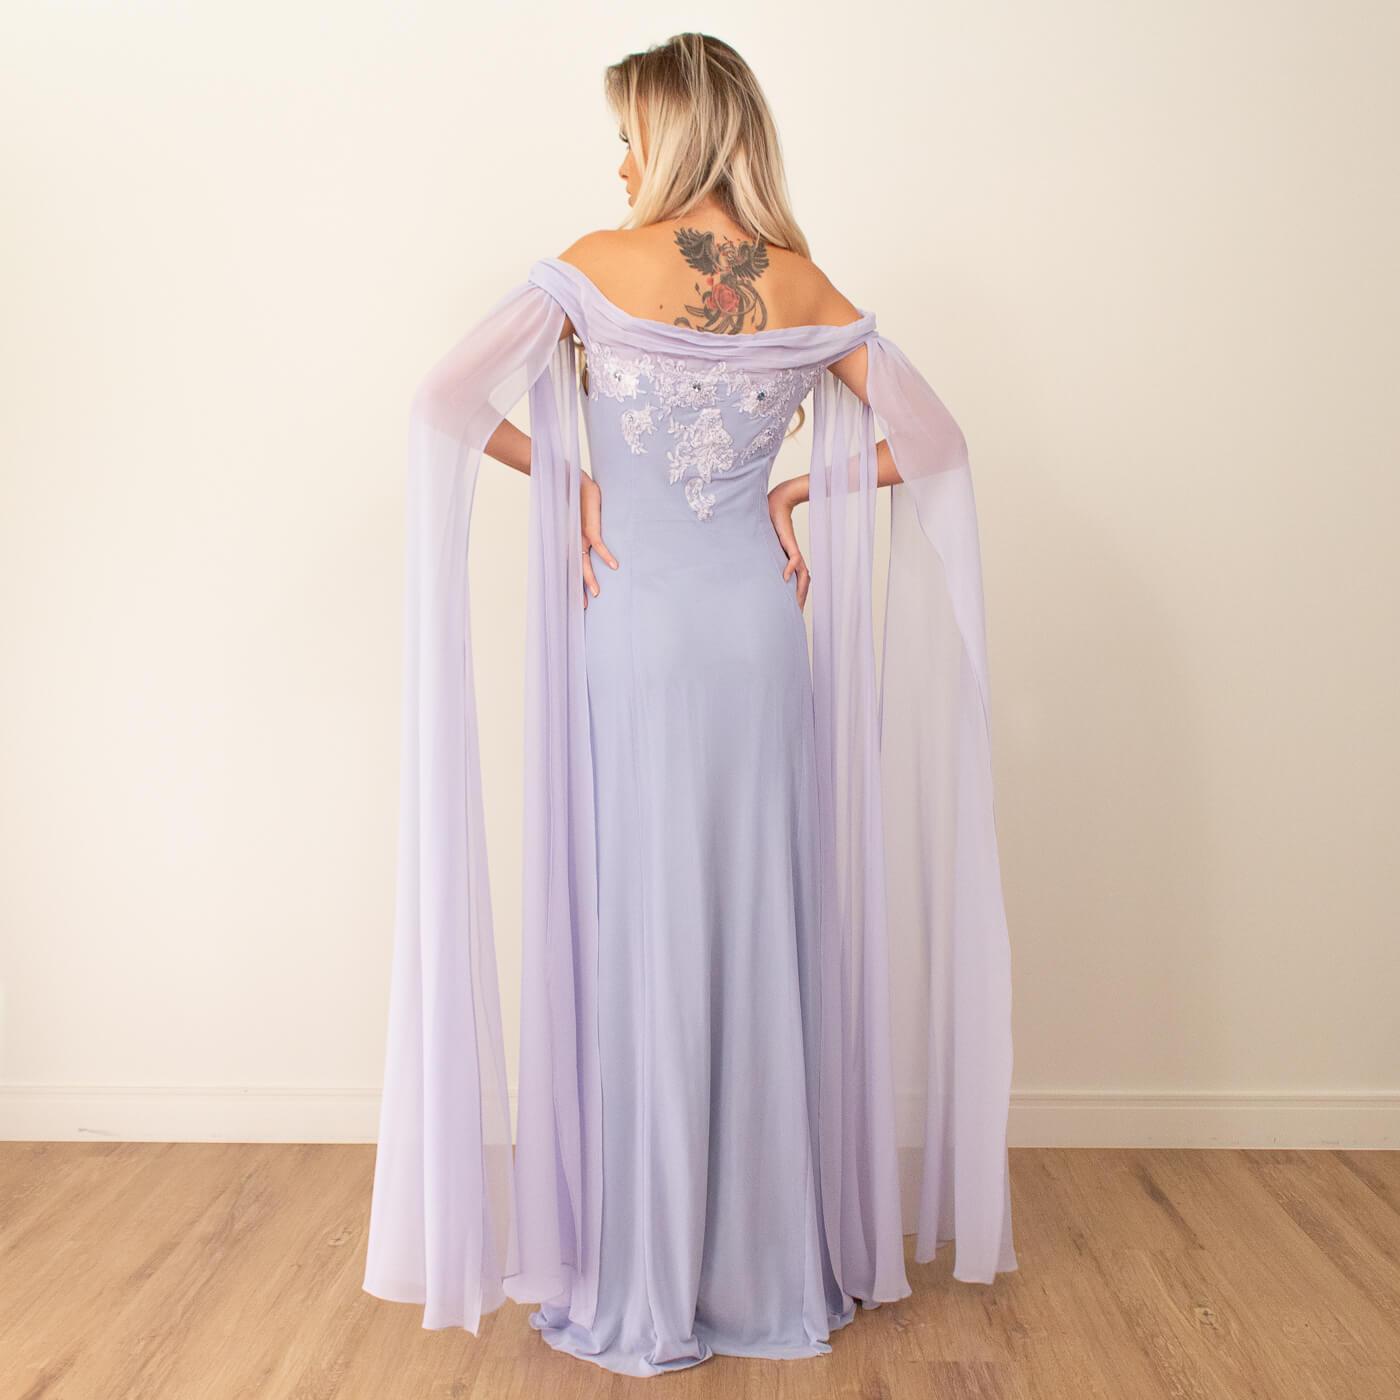 Vestido longo ombro a ombro Lika com mangas e detalhes bordados